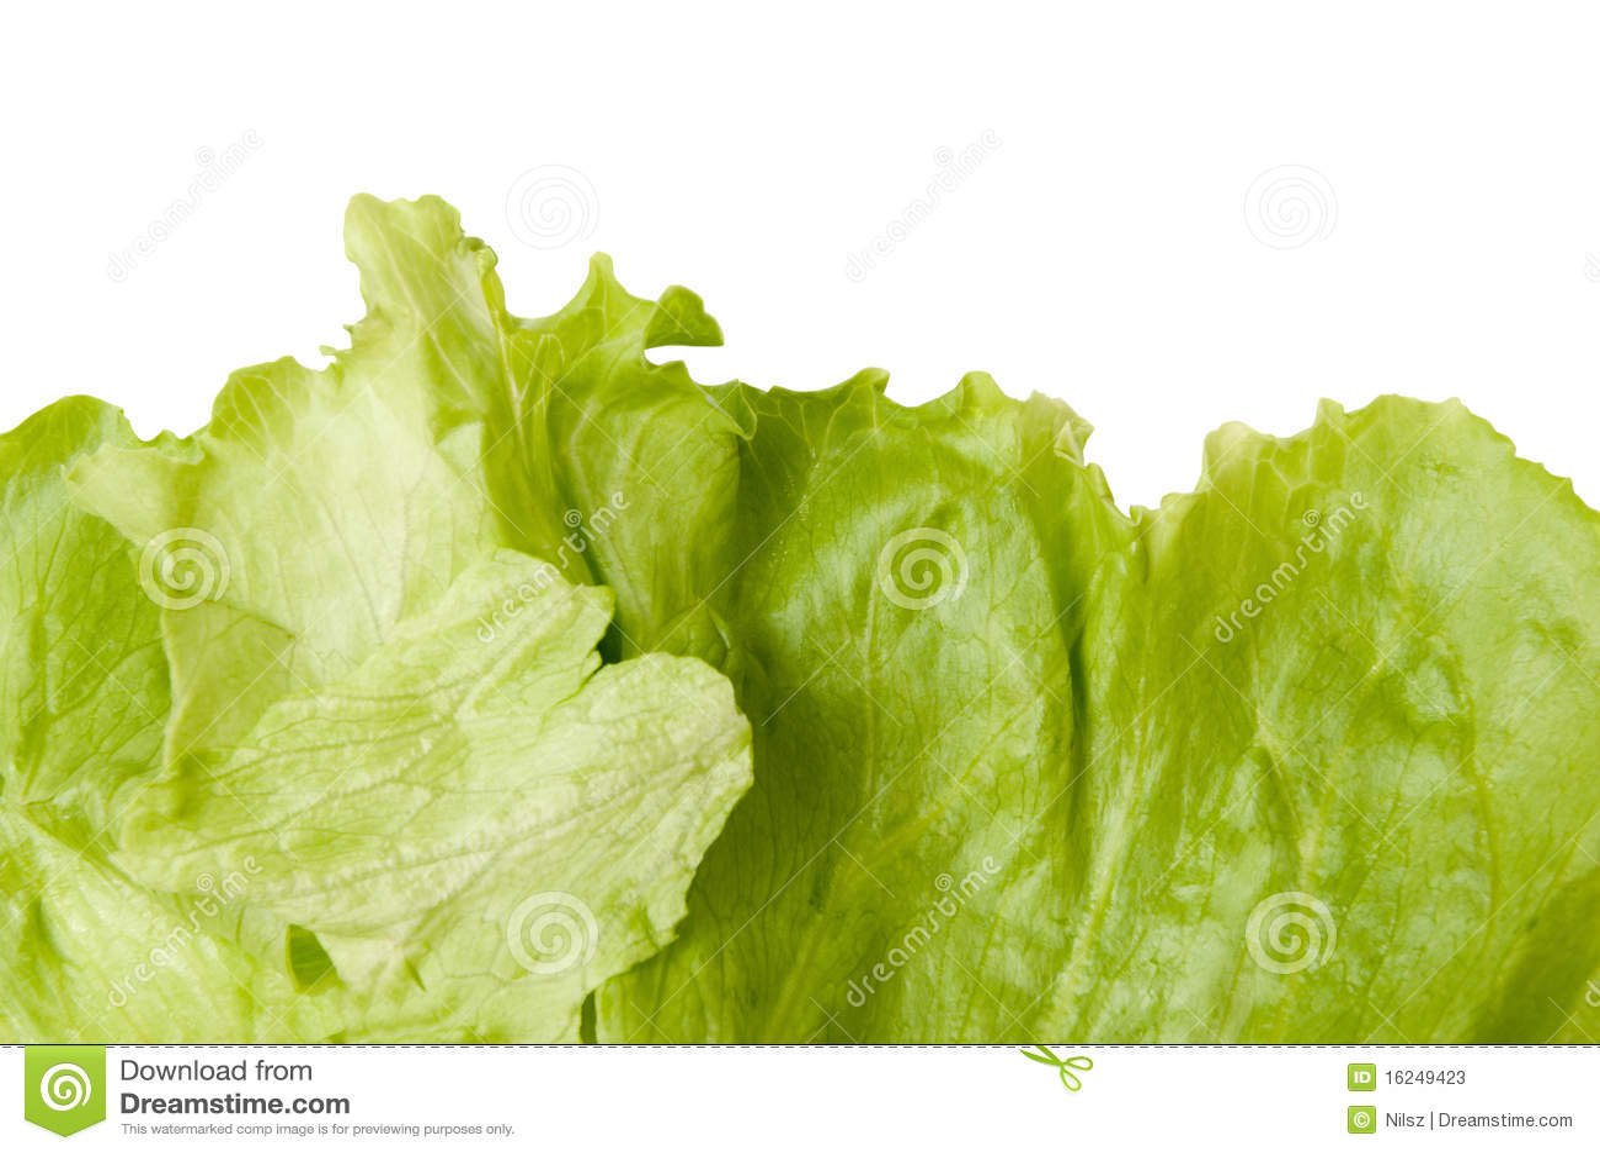 how to cut an iceberg lettuce